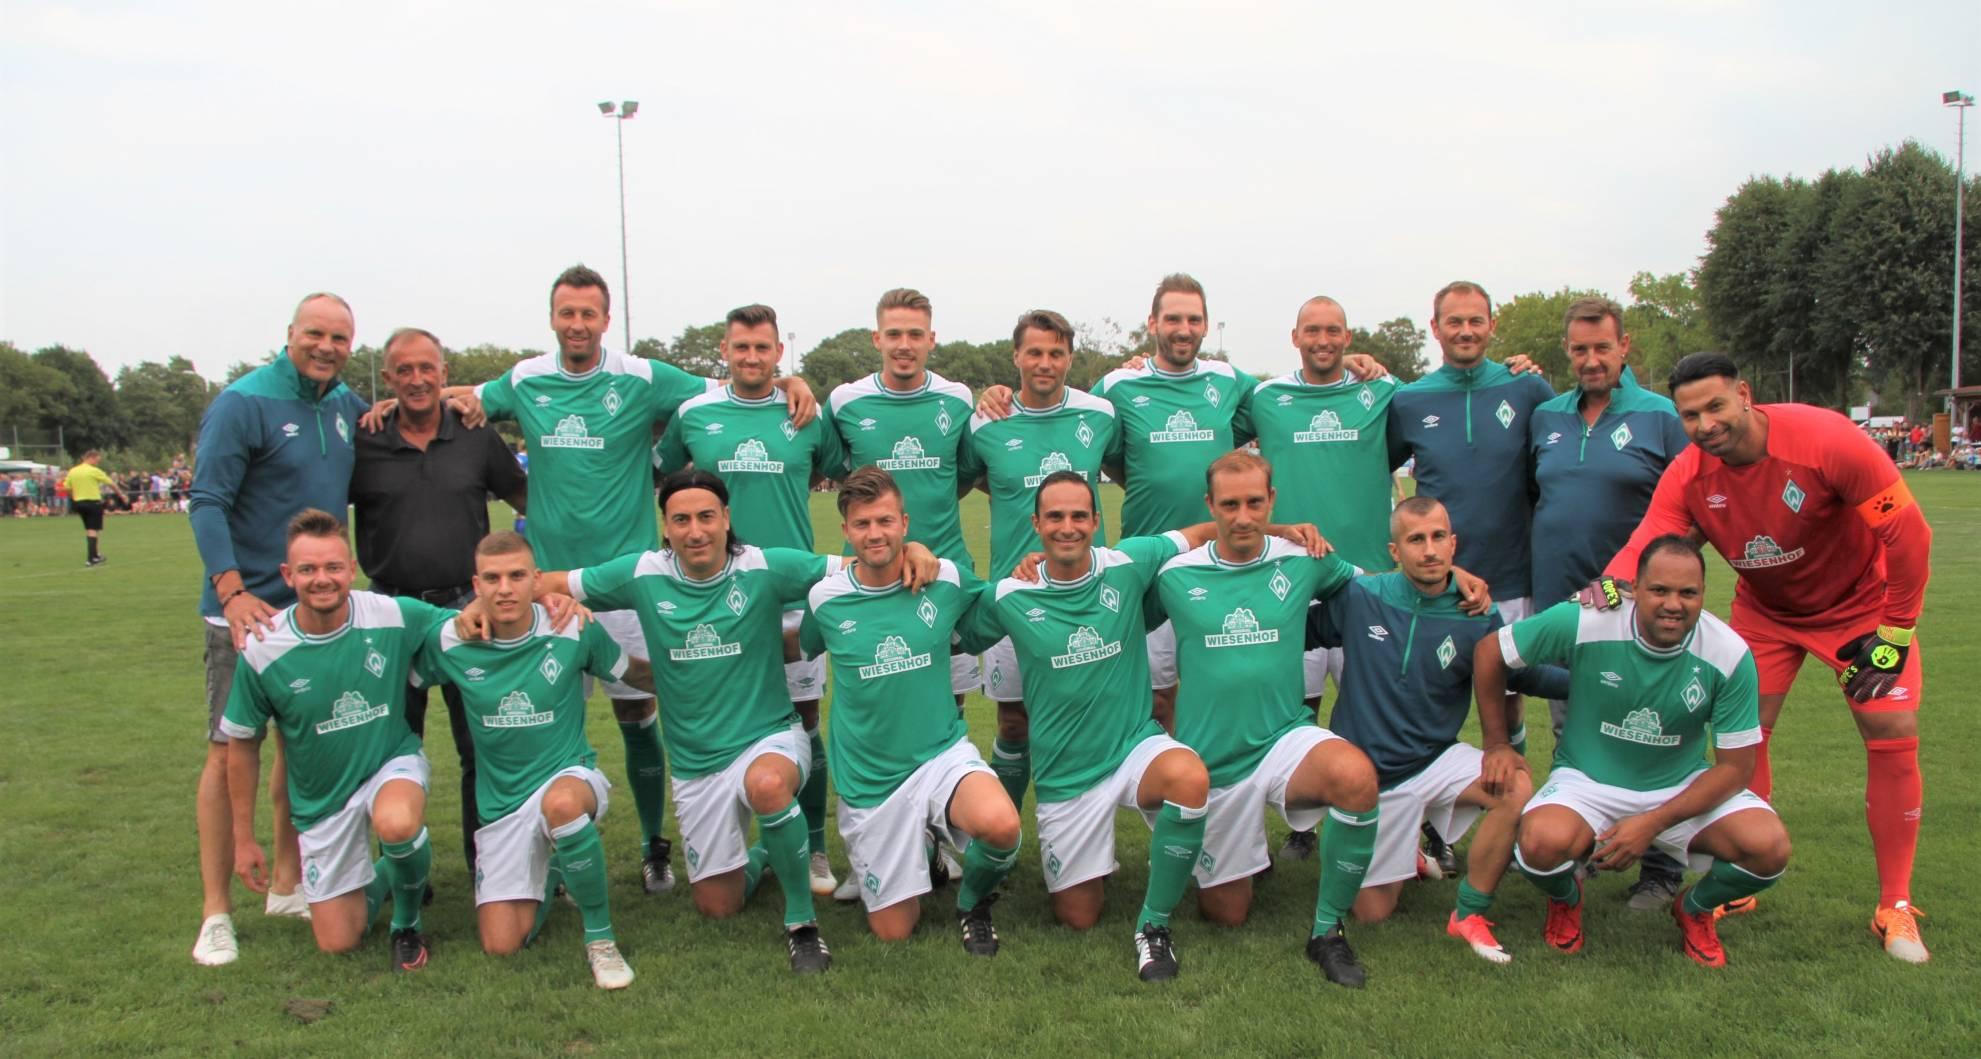 Werder Traditionsmannschaft